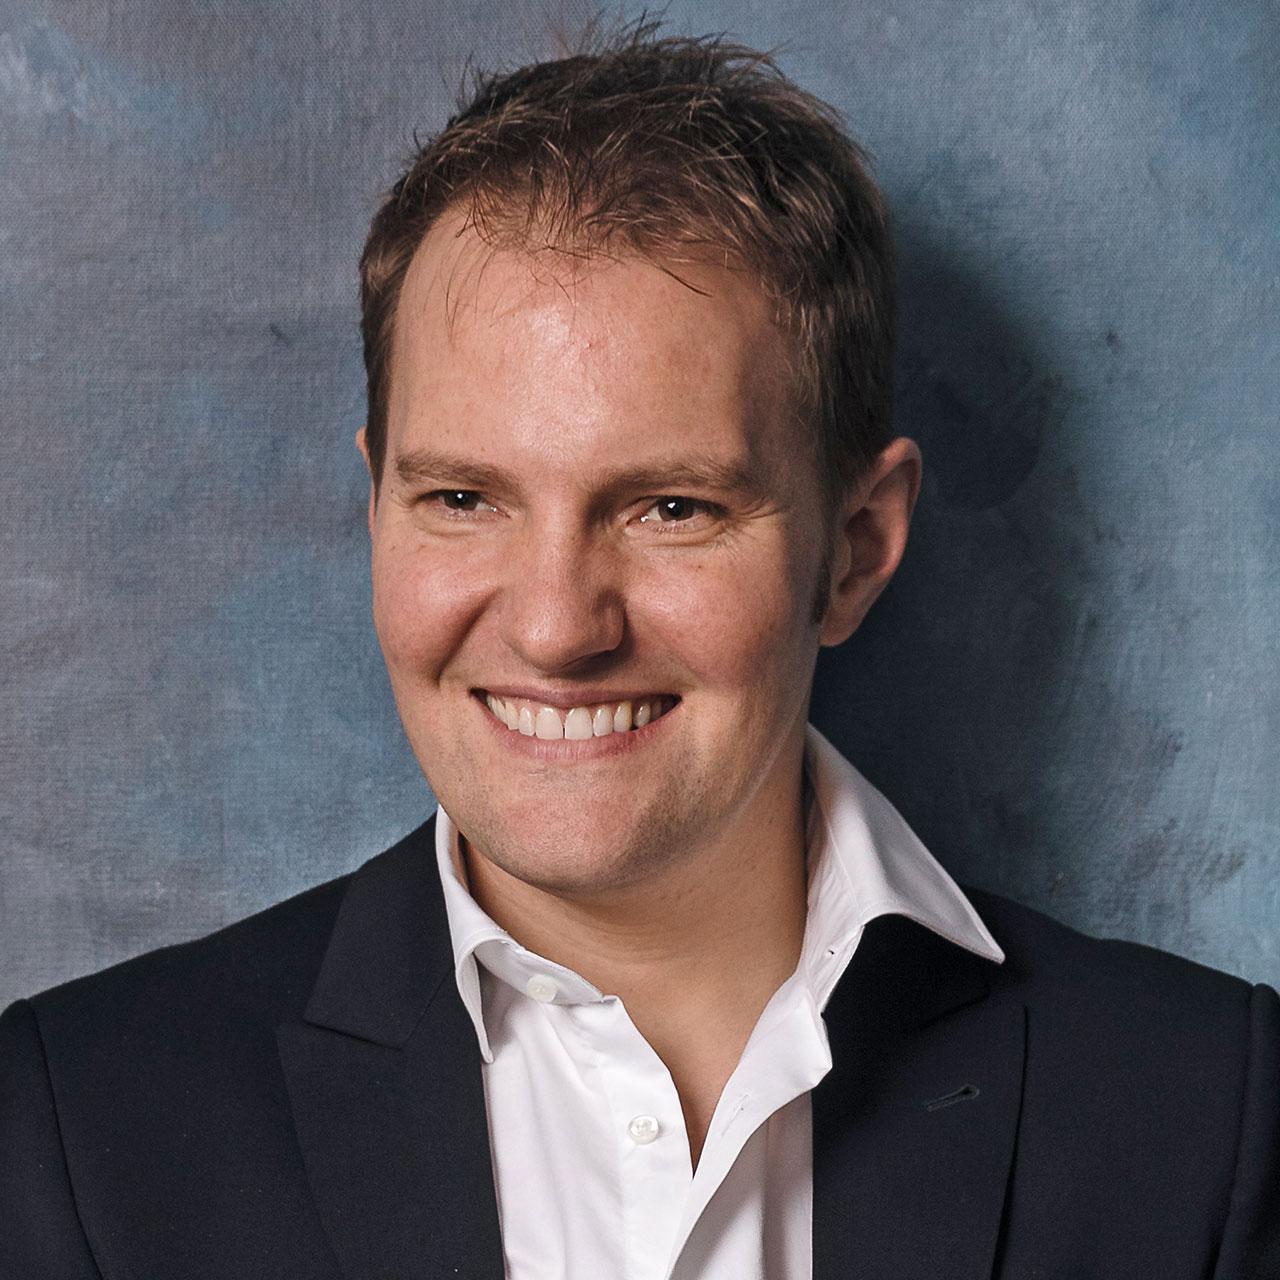 Florian Diebald